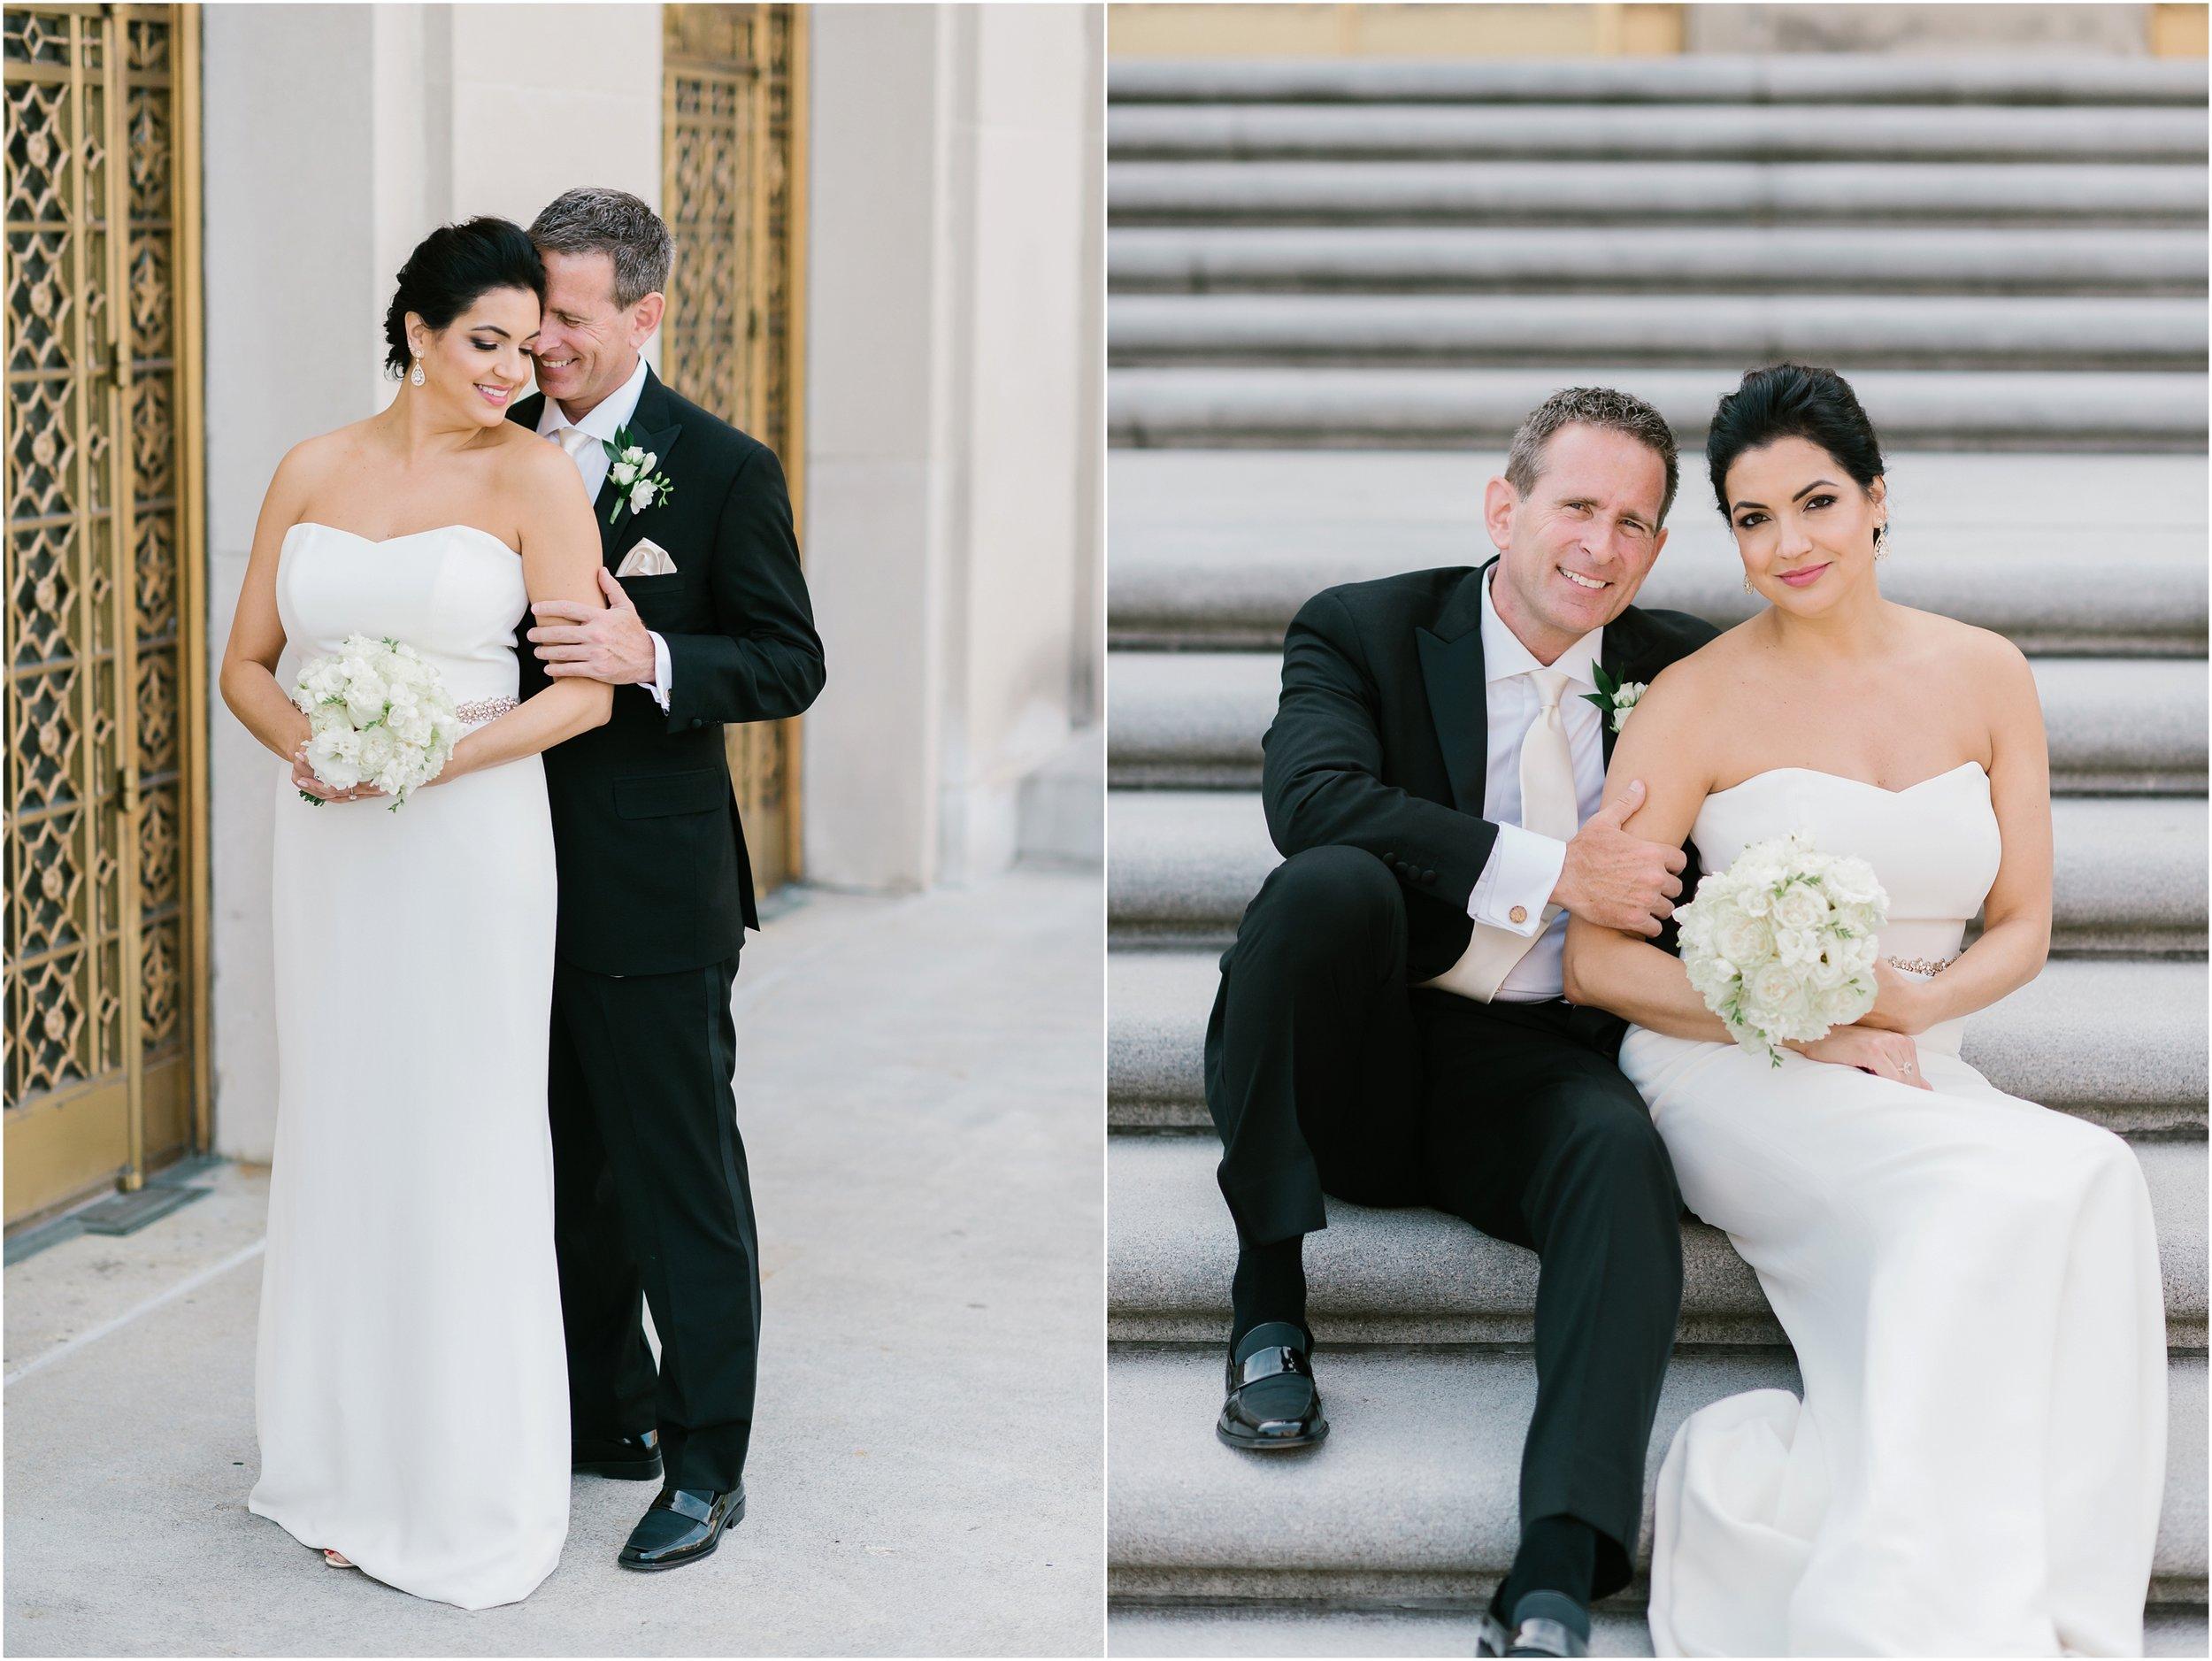 Rebecca_Shehorn_Photography_Indianapolis_Wedding_Photographer_8553.jpg